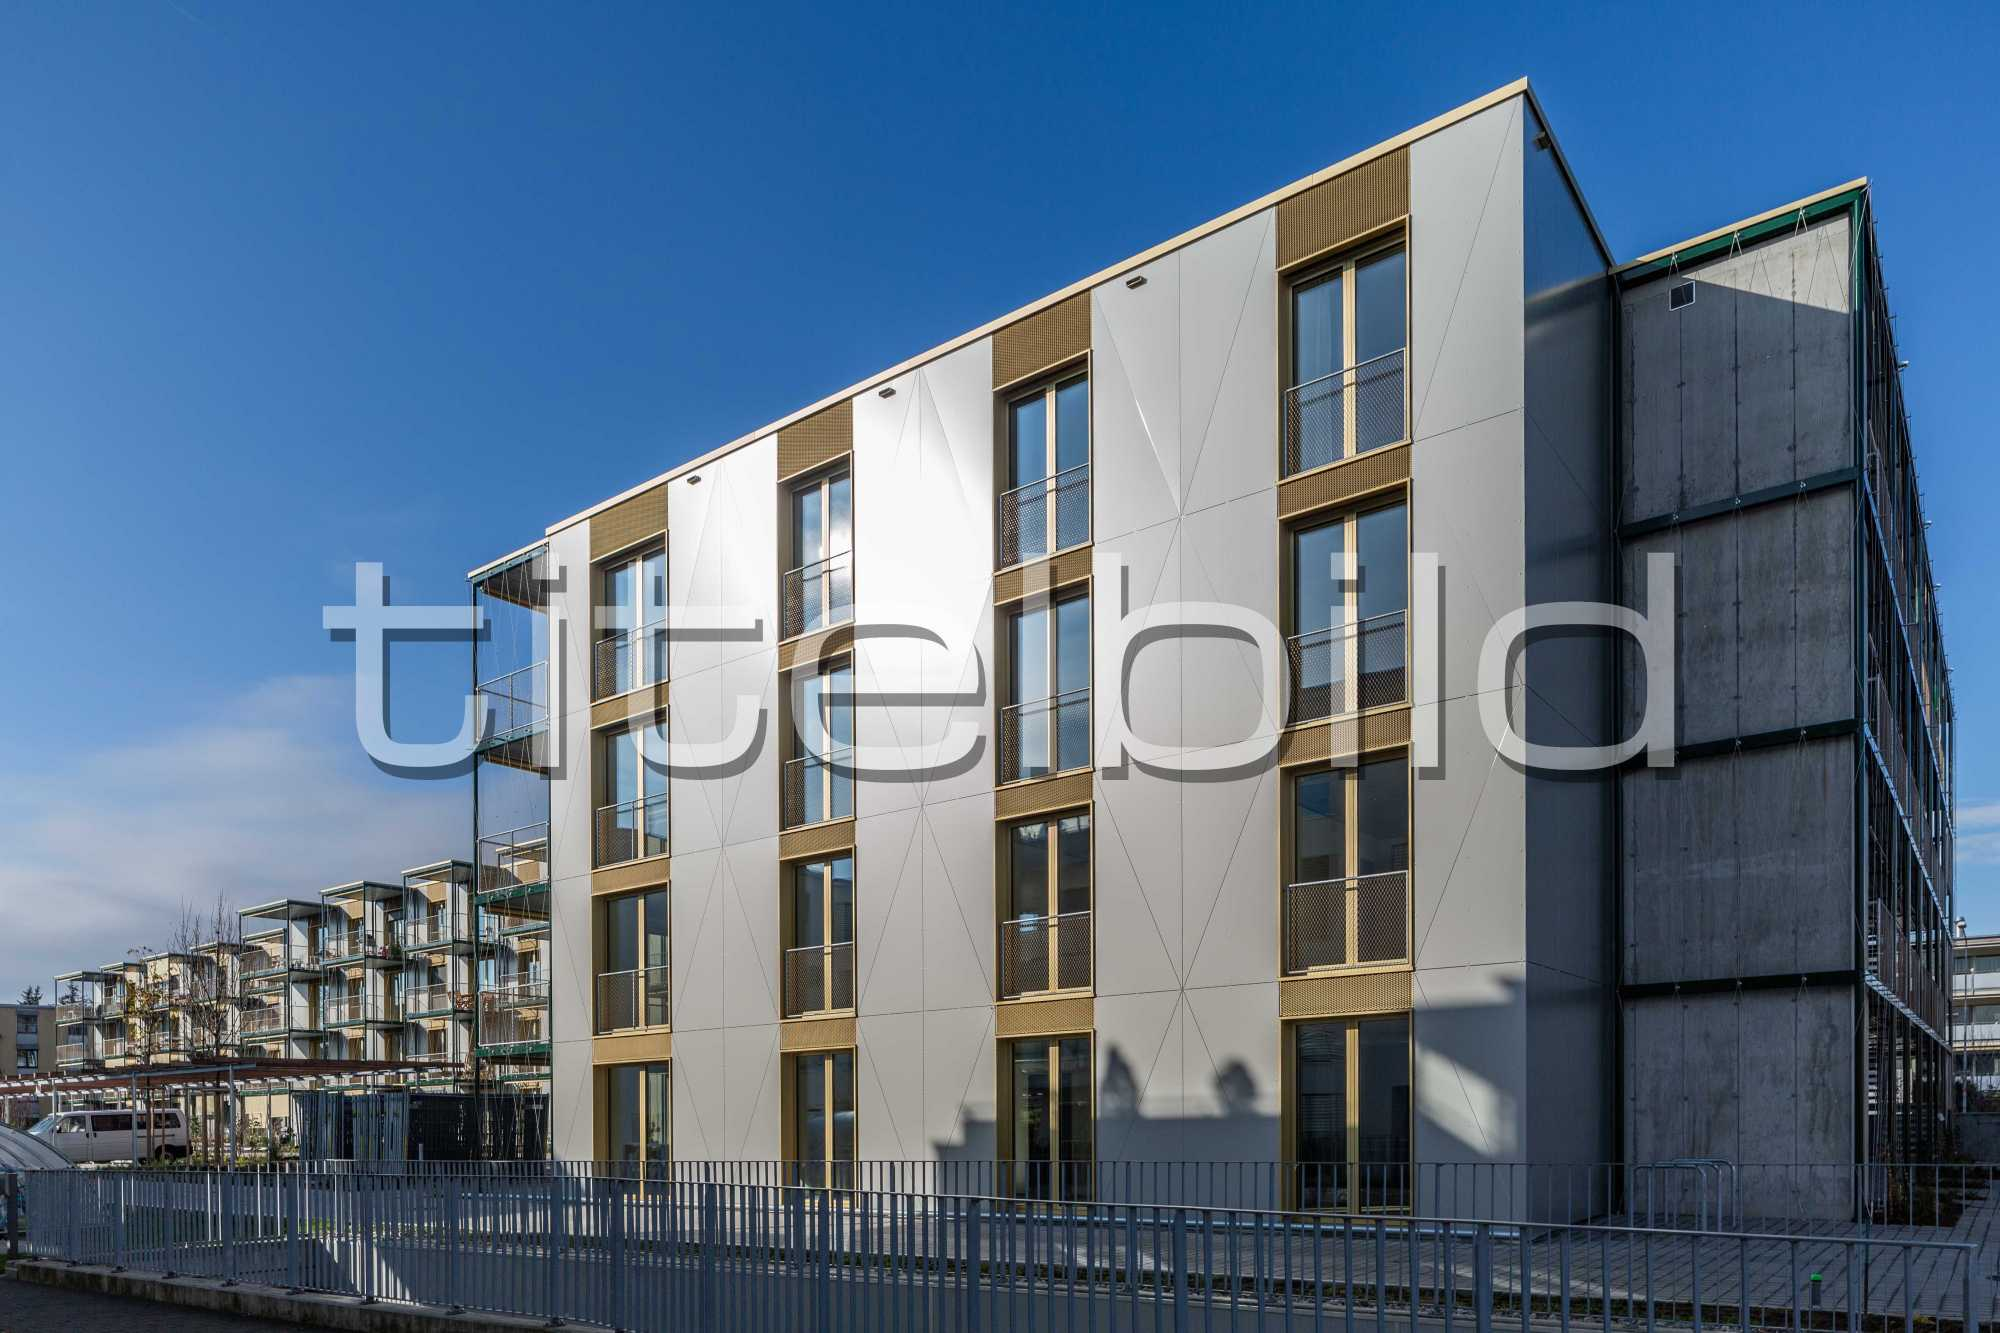 Projektbild-Nr. 2: Quattro Sorelle, Bülach